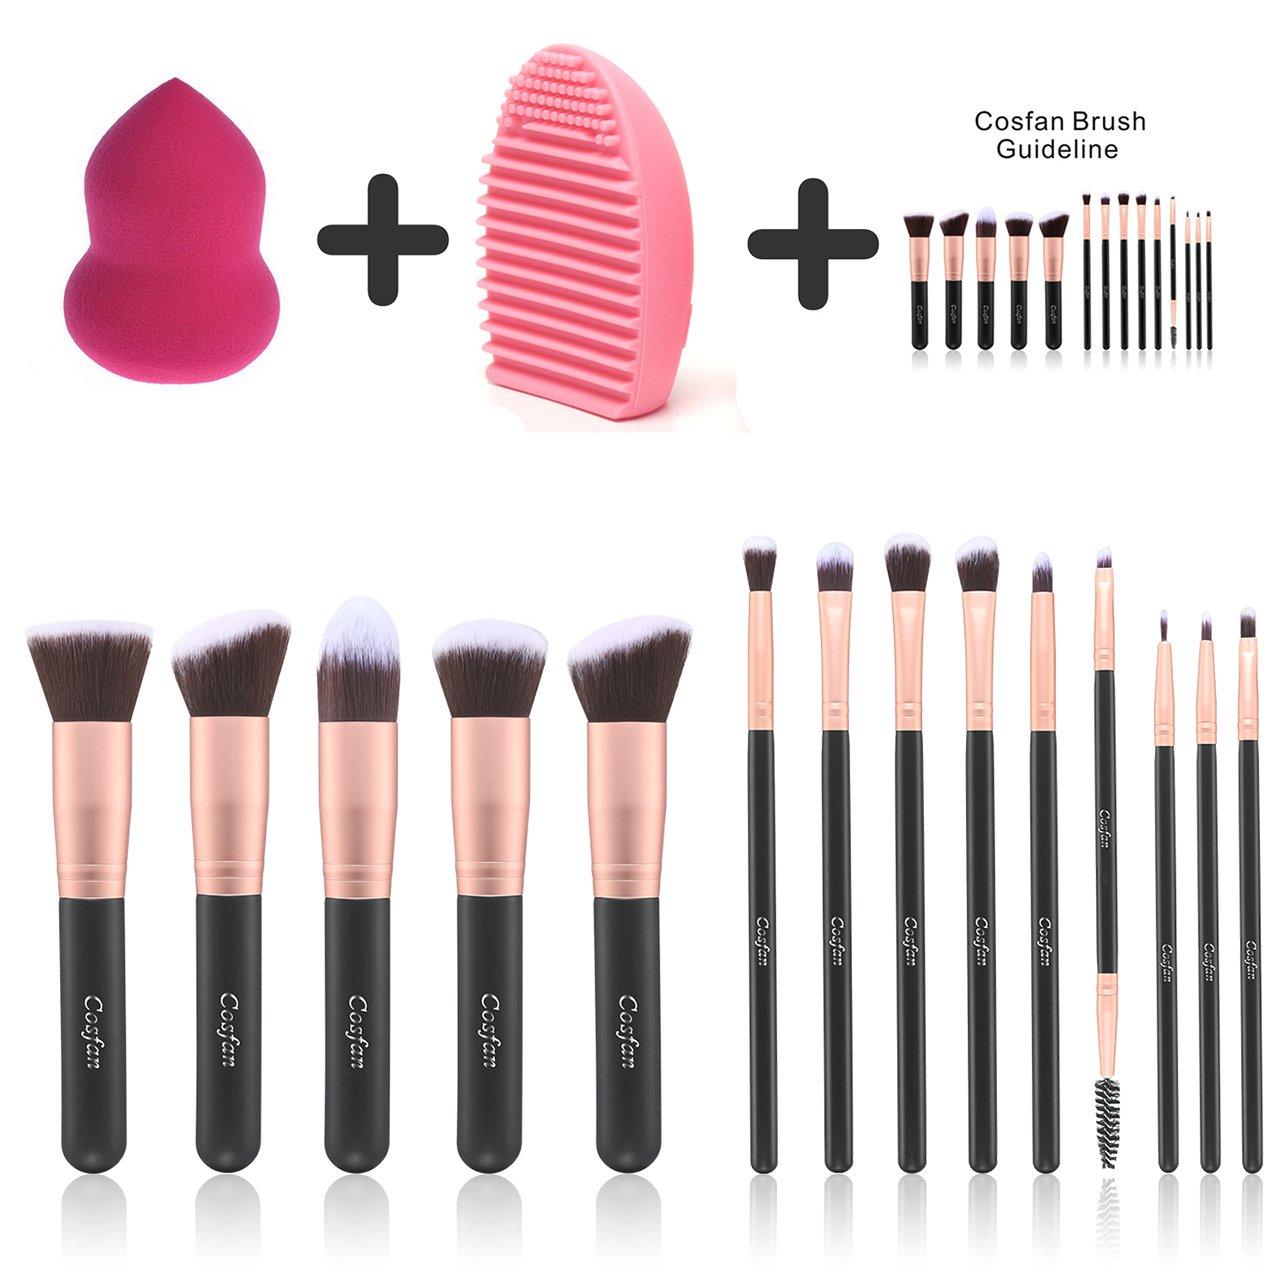 Makeup Brushes Powder Foundation Concealer Eyeliner Makeup Brush Set Cosmetics Tool (14 PCS Rose Gold) COSFAN